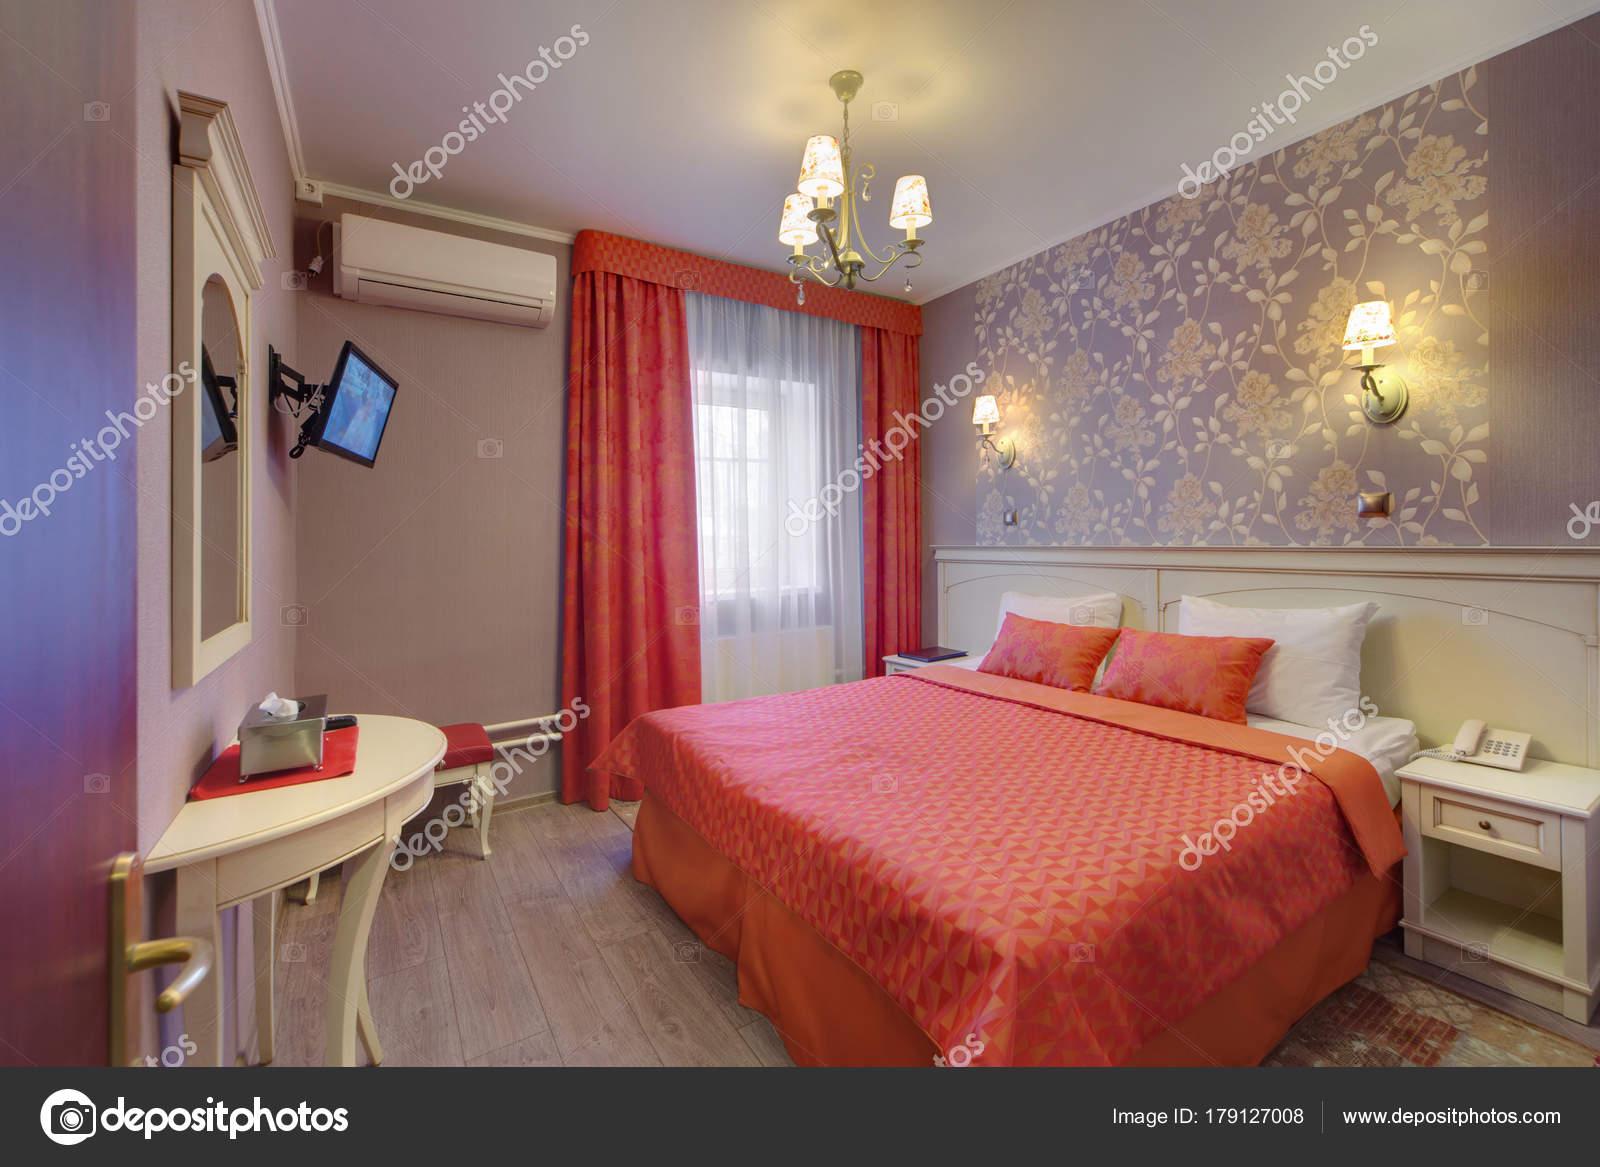 Orange Bedroom Cover Bed Orange Curtains Window — Stock Photo ...